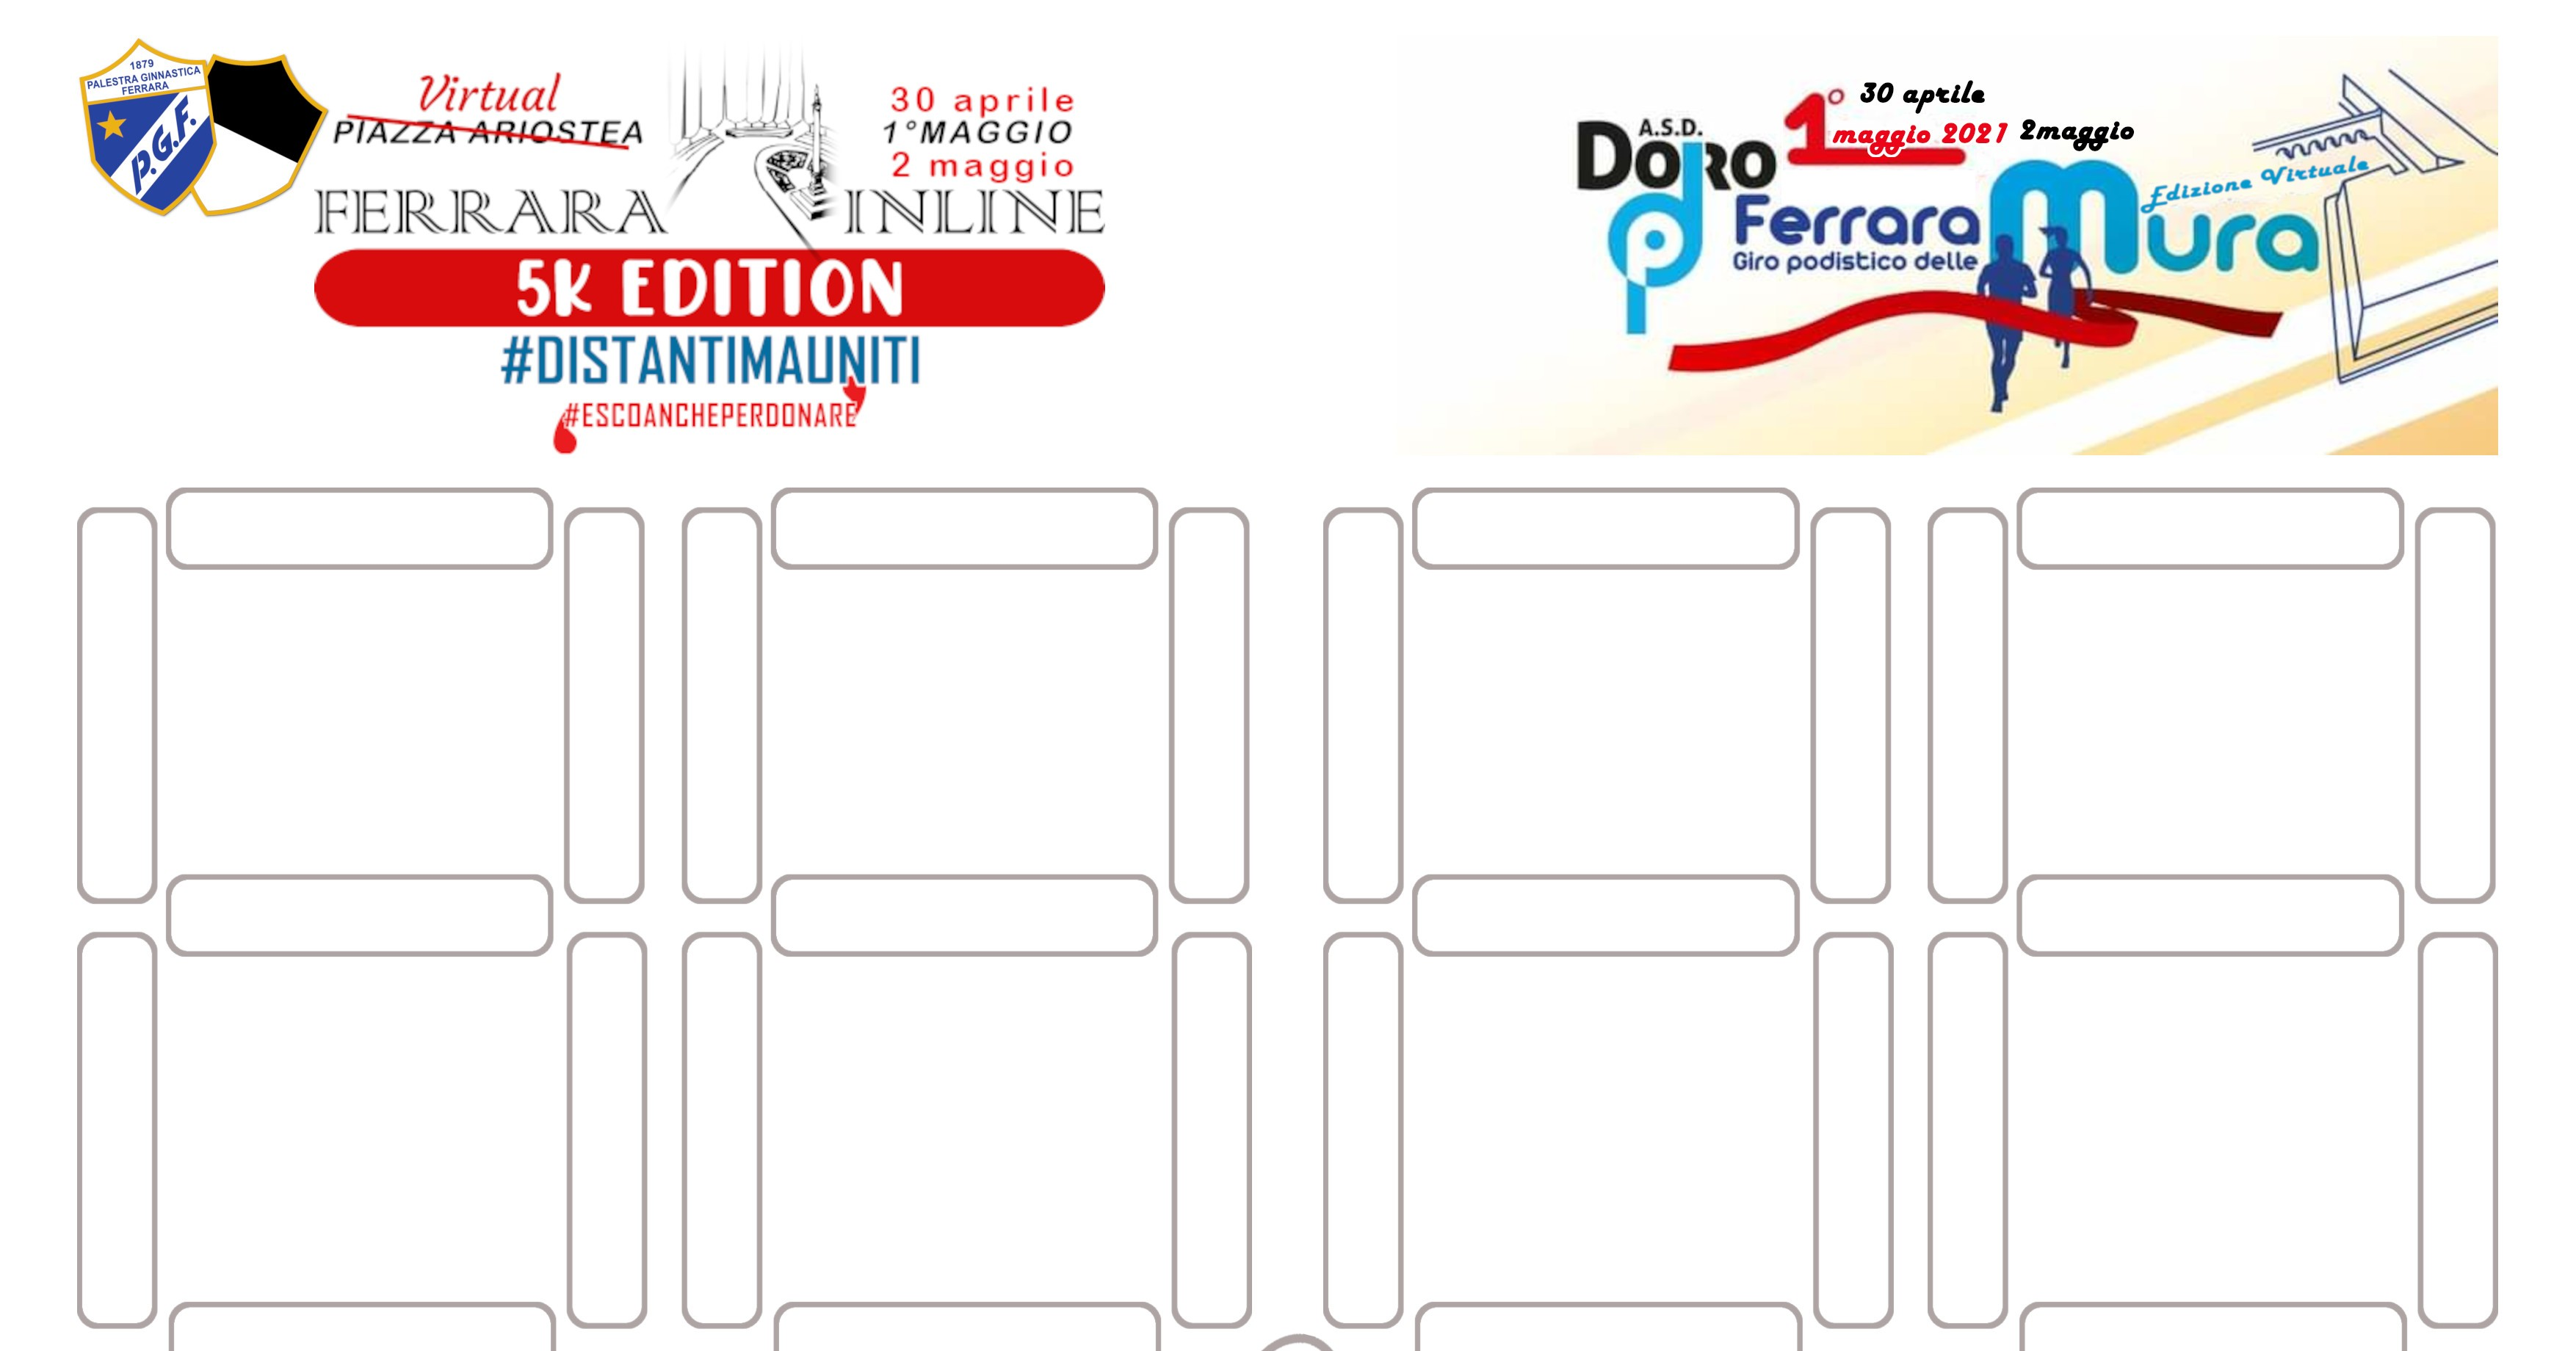 1°maggio Ferrara Inline 2021 5k edition-Palestra Ginnastica Ferrara a.s.d.